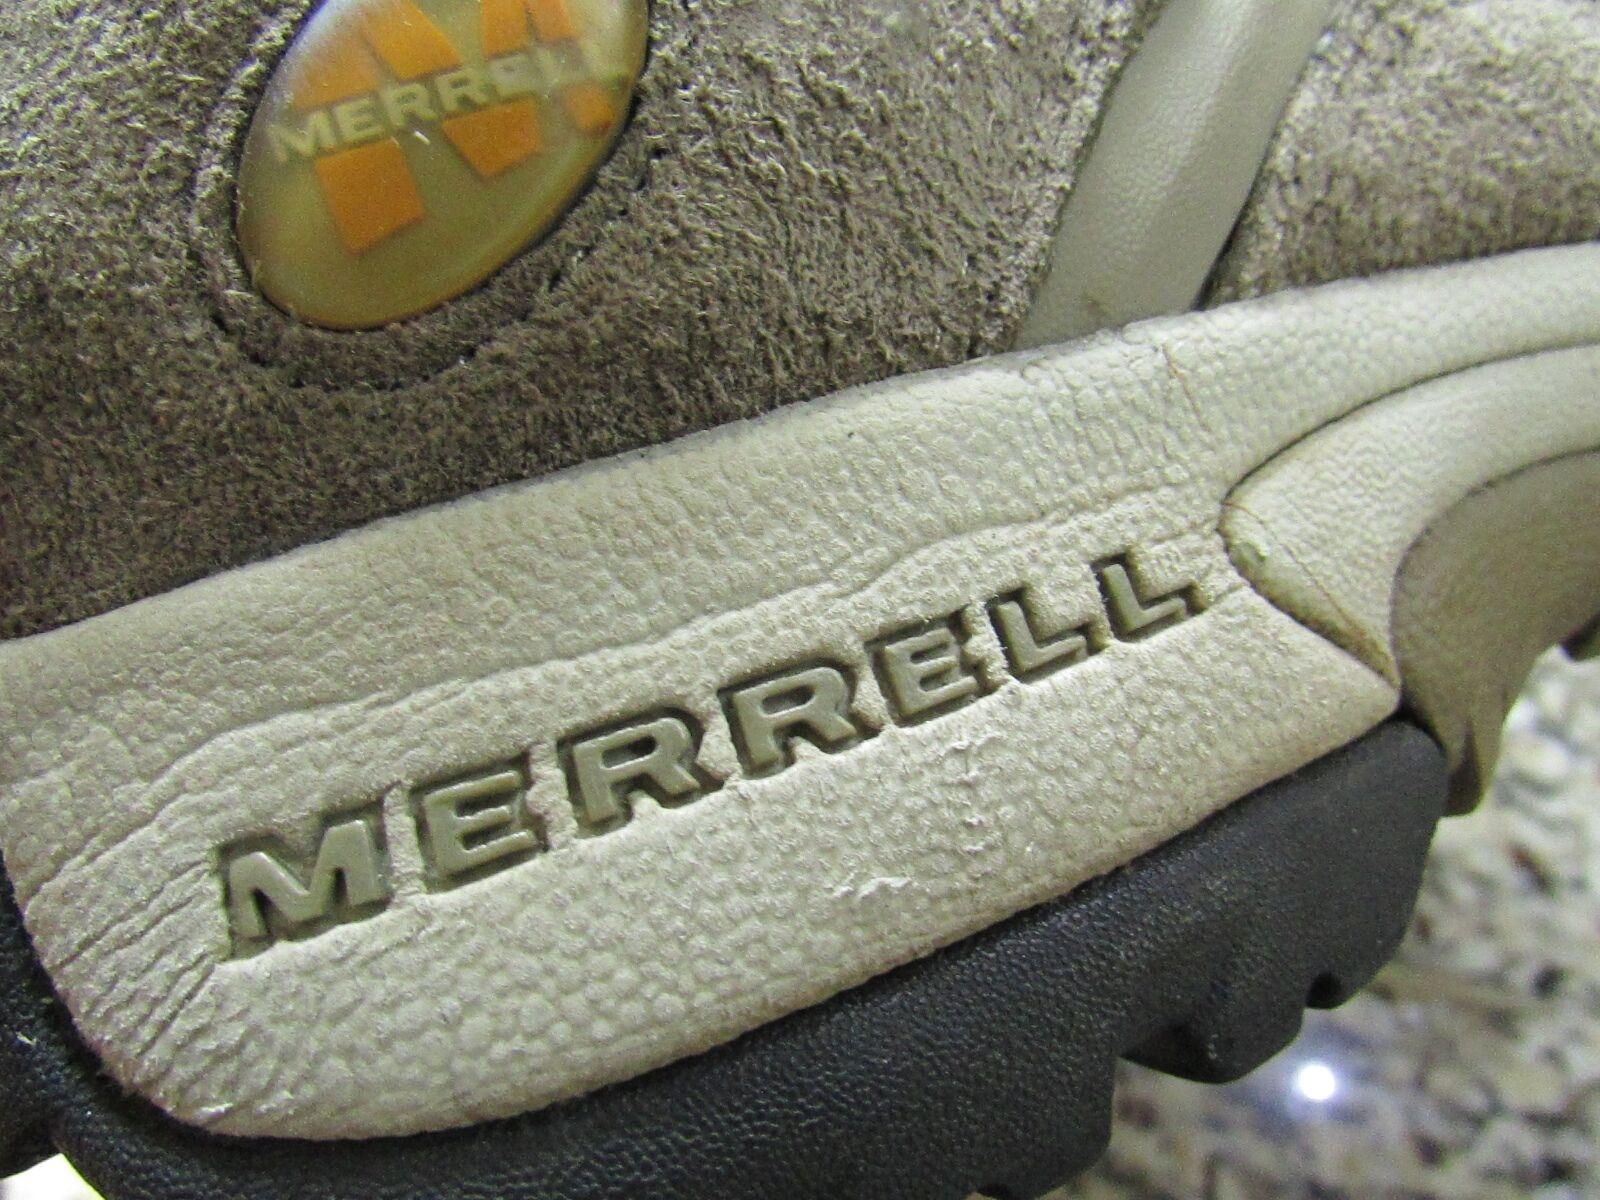 MERRELL HIKING TRAIL TRAIL TRAIL  Chaussures  femmes  8 SUEDE FREE SHIP bd7013